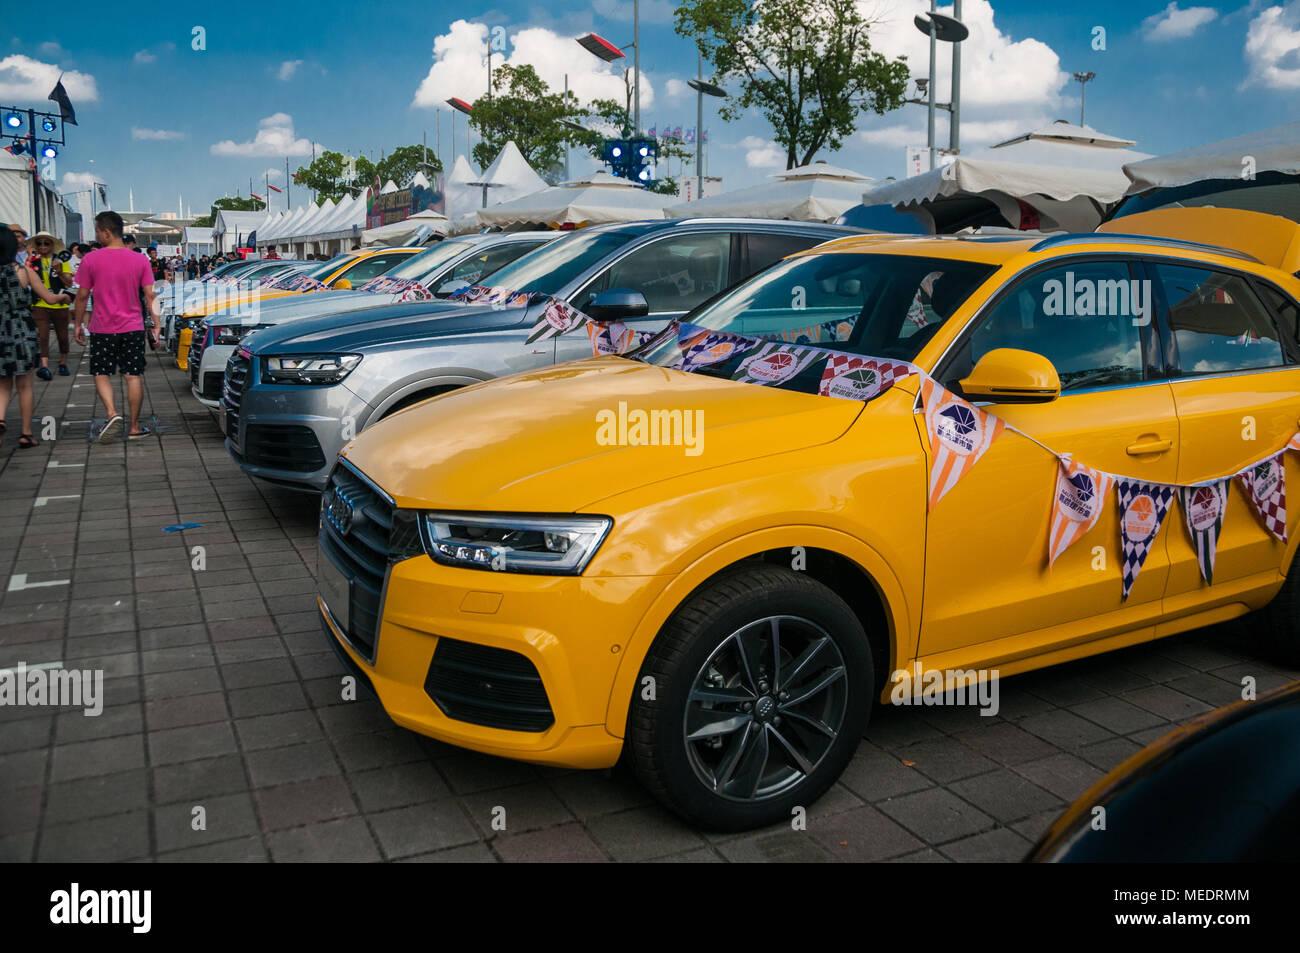 Audi Cherry Hill >> Audi Cars Stock Photos & Audi Cars Stock Images - Alamy